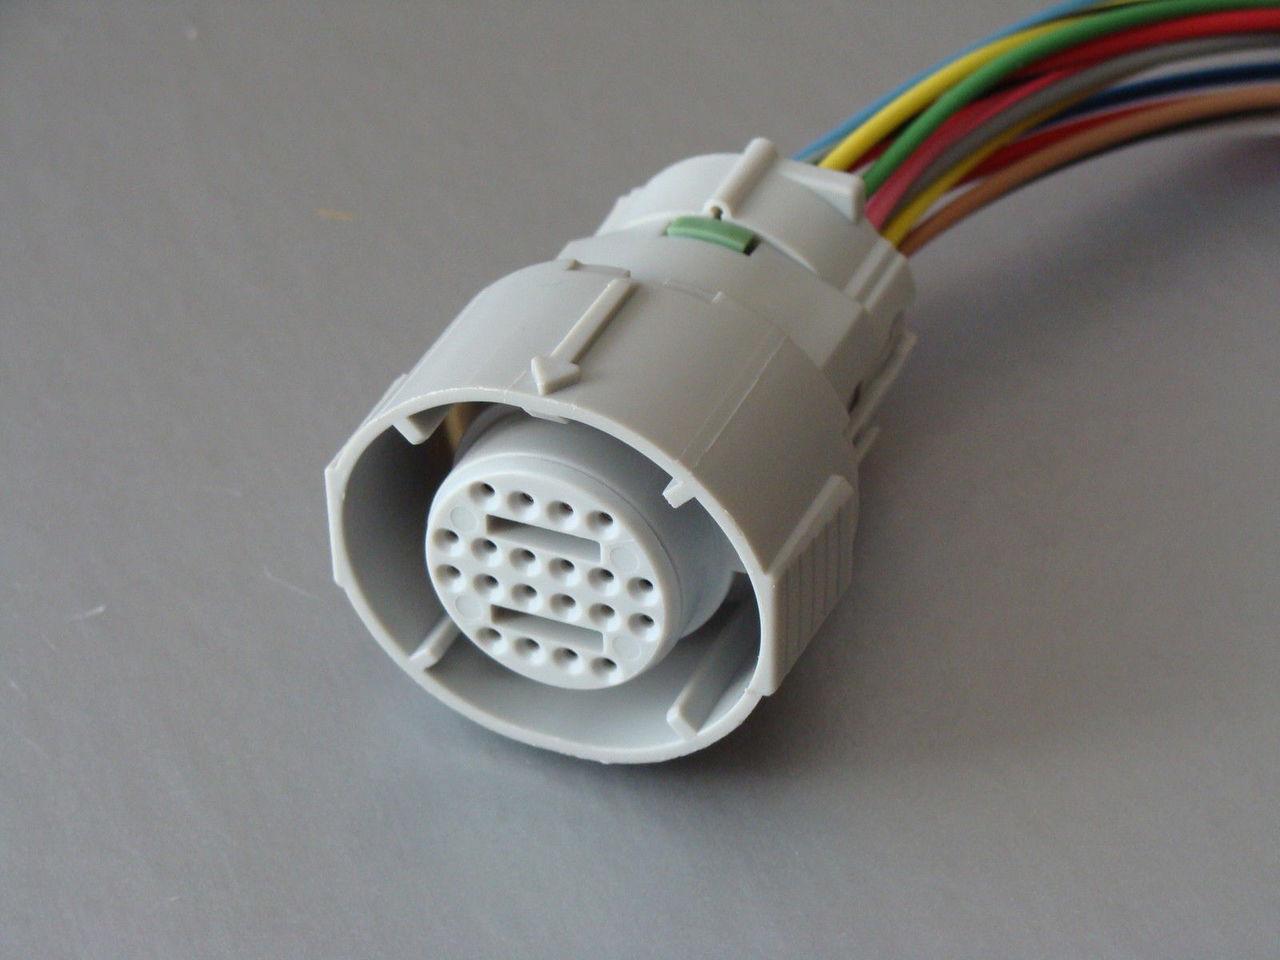 hight resolution of 94 02 ls1 lt1 4l60e automatic transmission harness connector hawks lt1 4l60e wiring harness